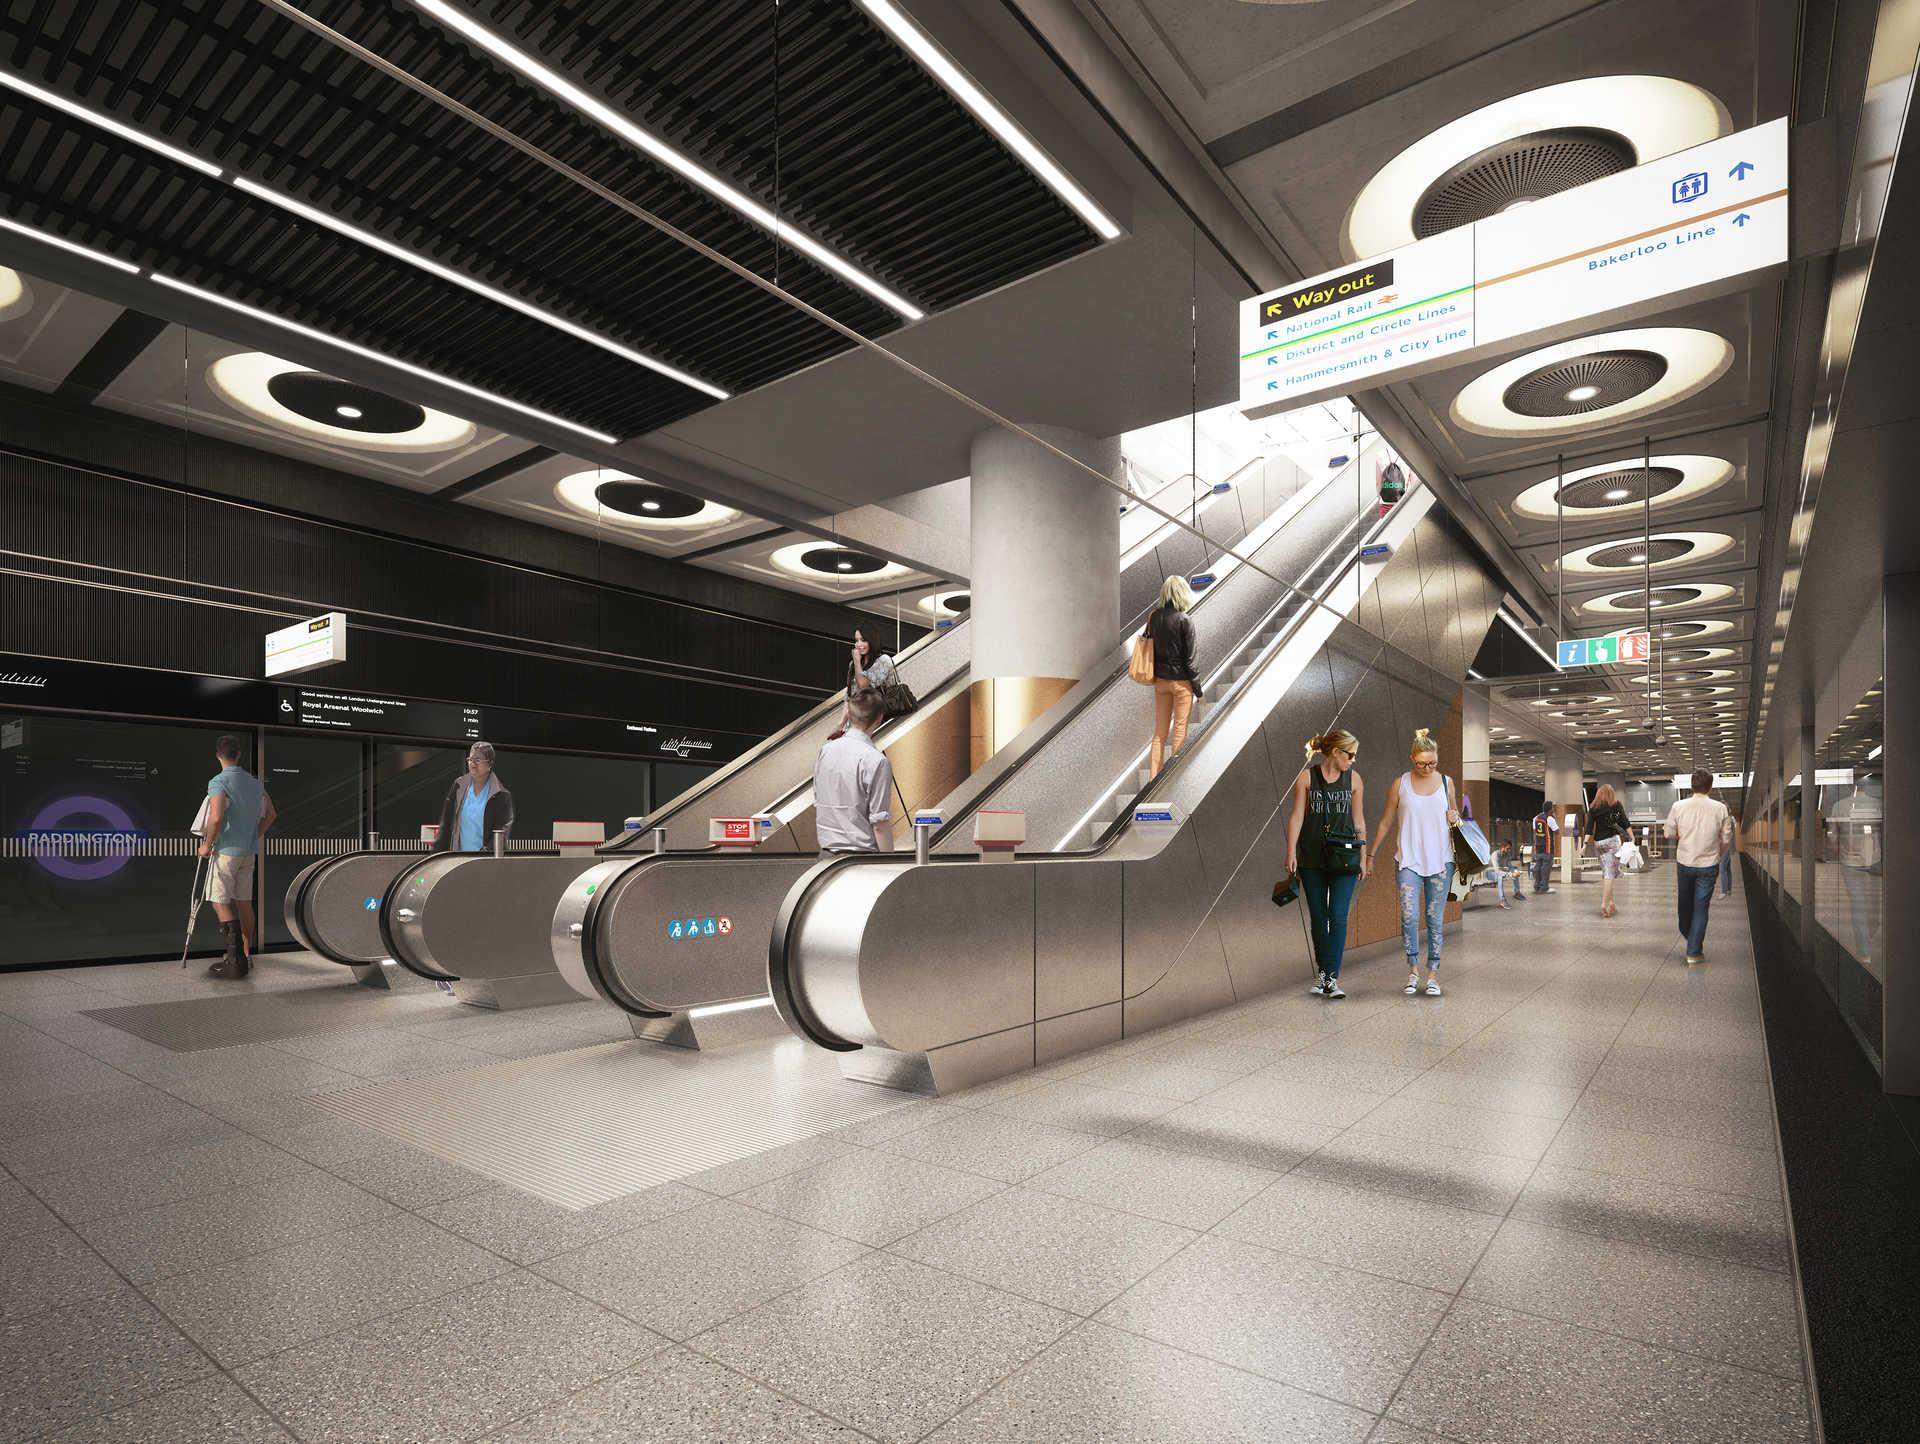 01_paddington_station_proposed_platform_level_235982.jpg